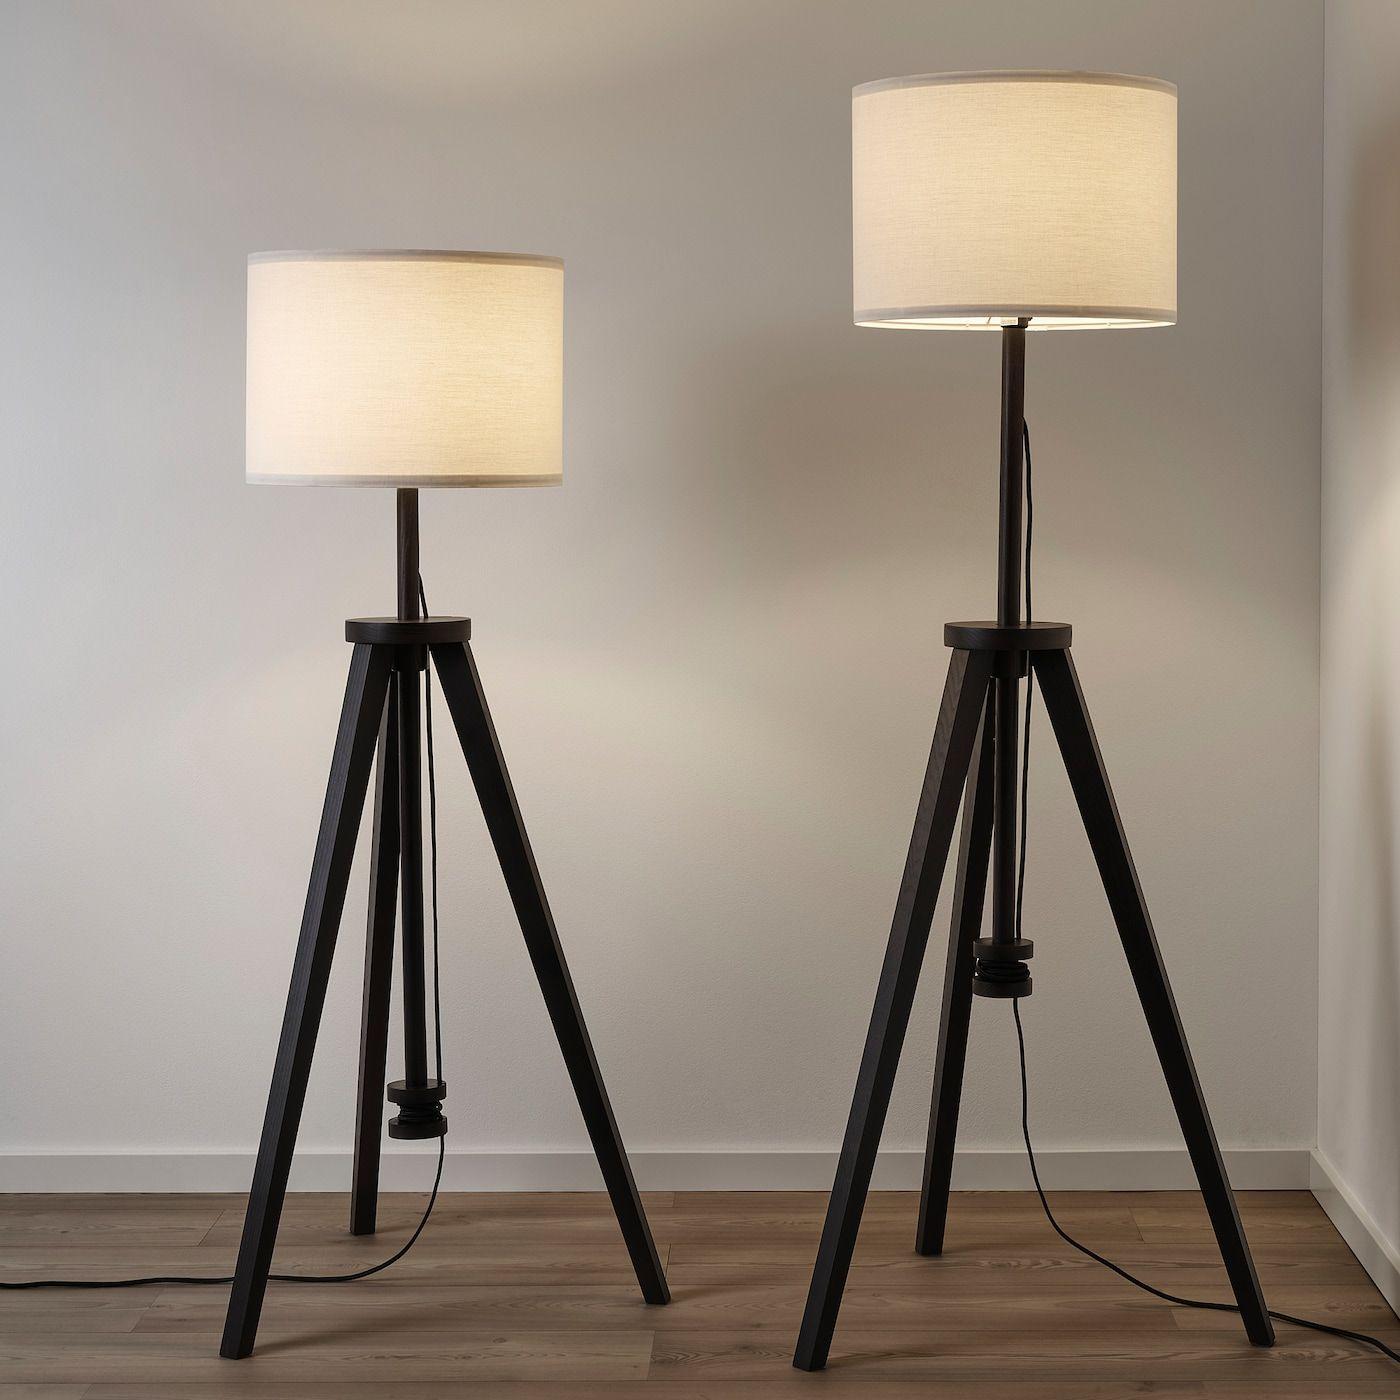 Lauters Floor Lamp Brown Ash White Ikea In 2020 Floor Lamp White Floor Lamp Lamp